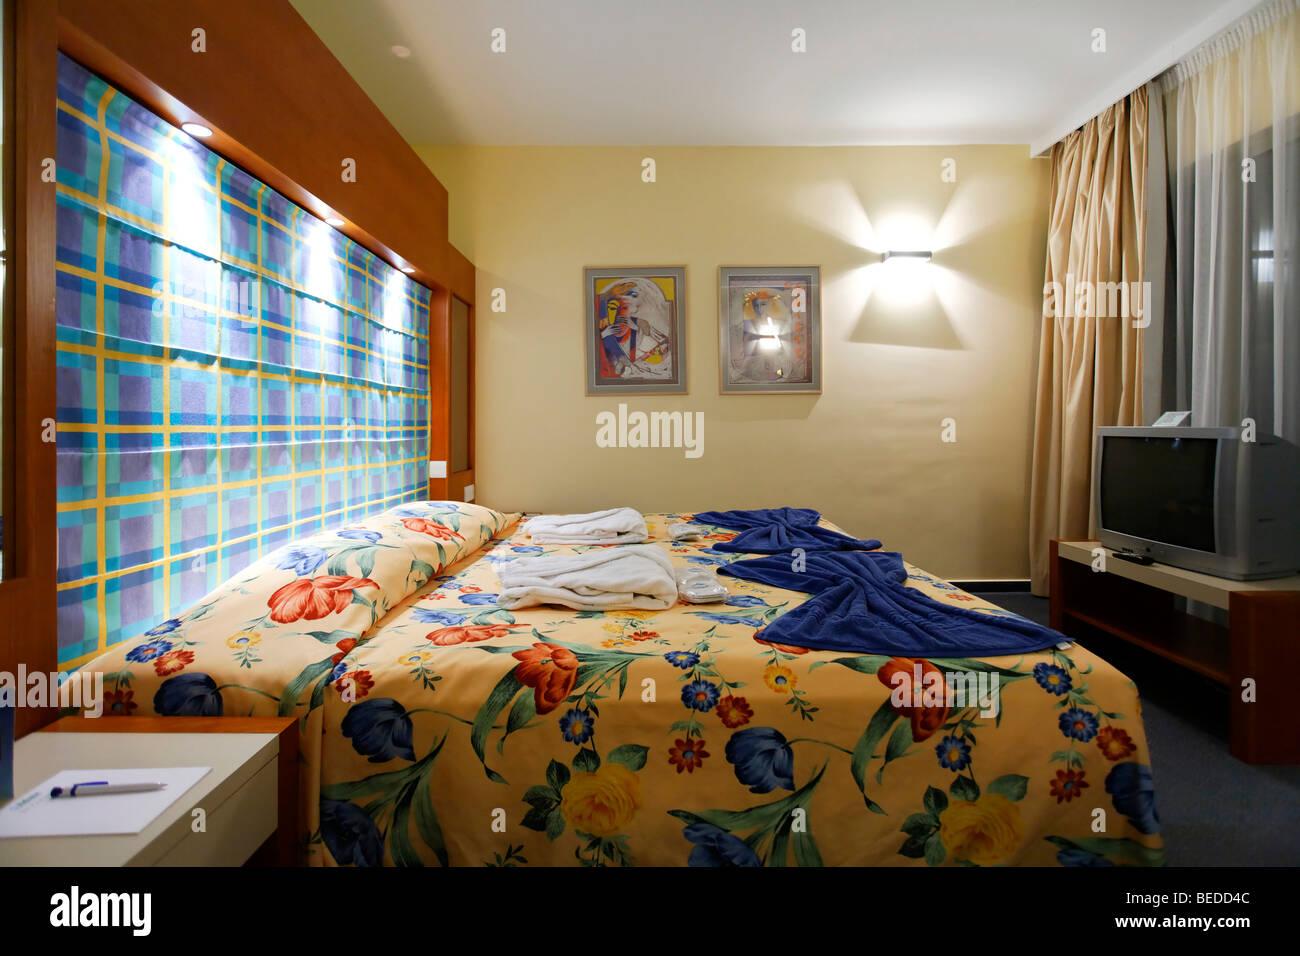 Room, Aldiana Club, Larnaca, Cyprus, Asia - Stock Image